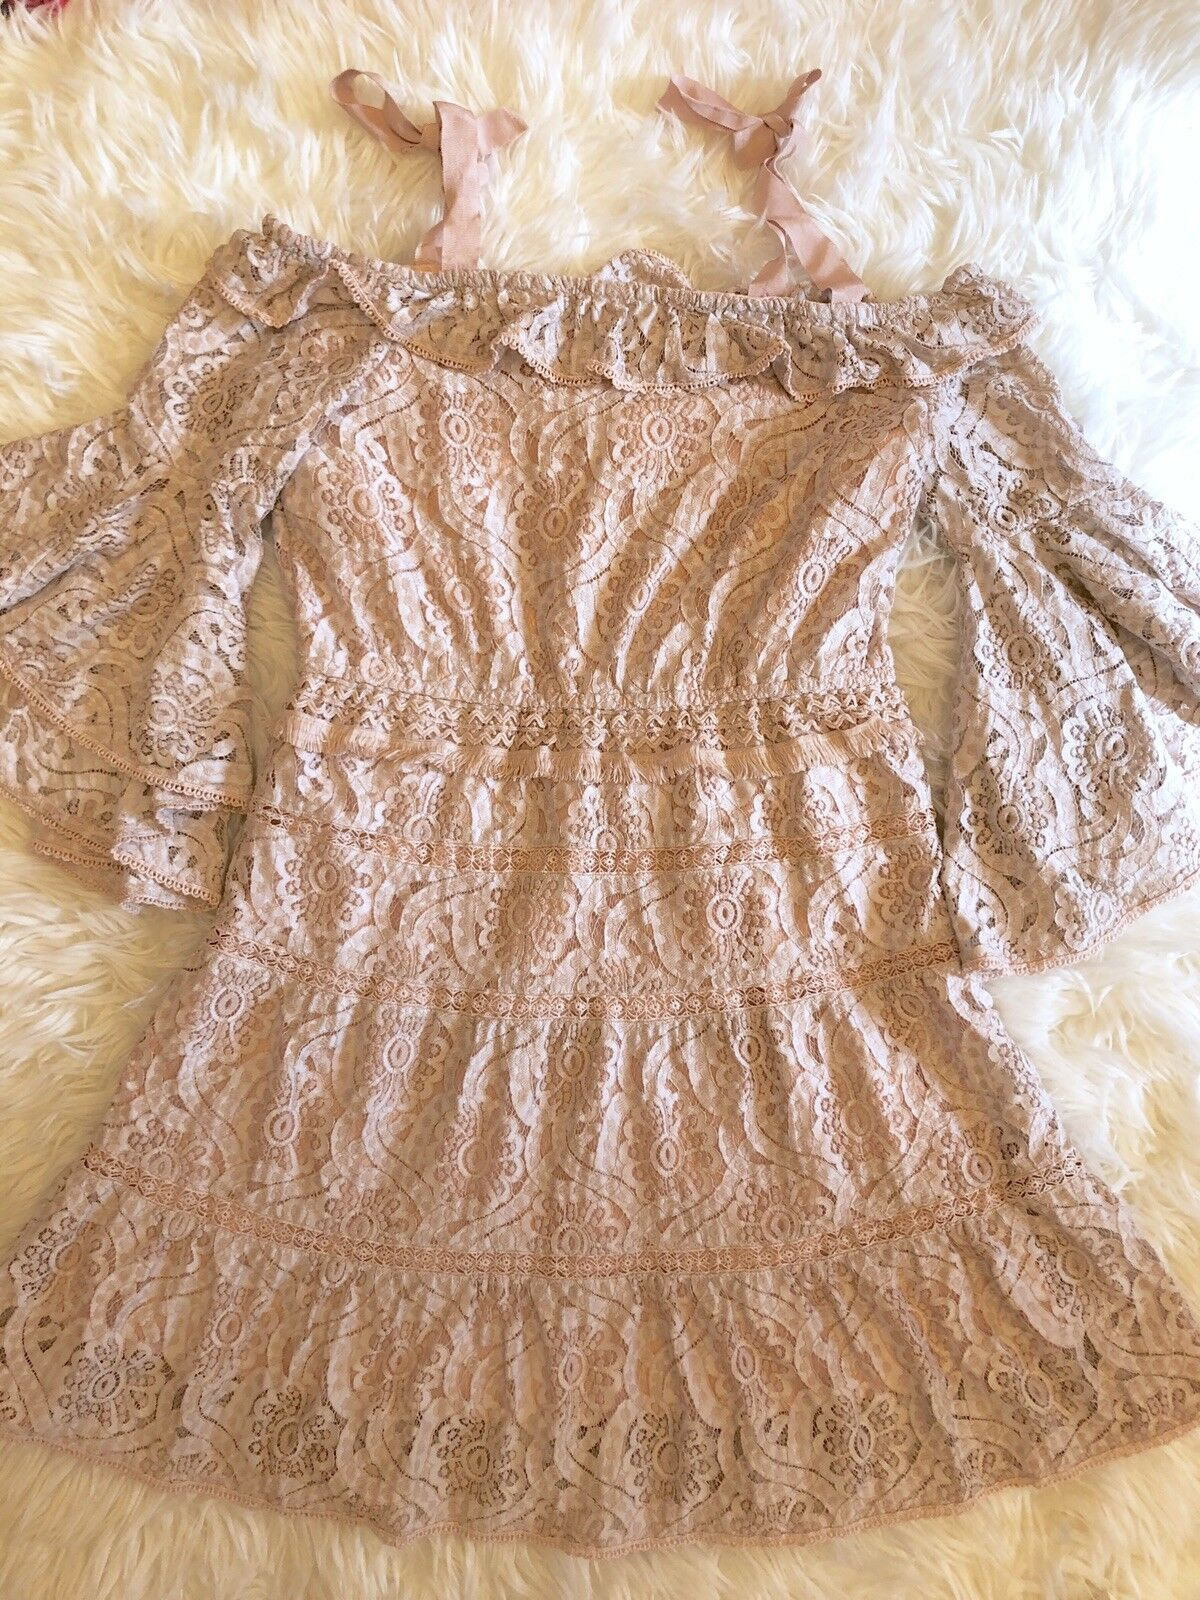 Foxiedox Foxiedox Foxiedox Lace Bell Sleeve Dress Size XL cbda15